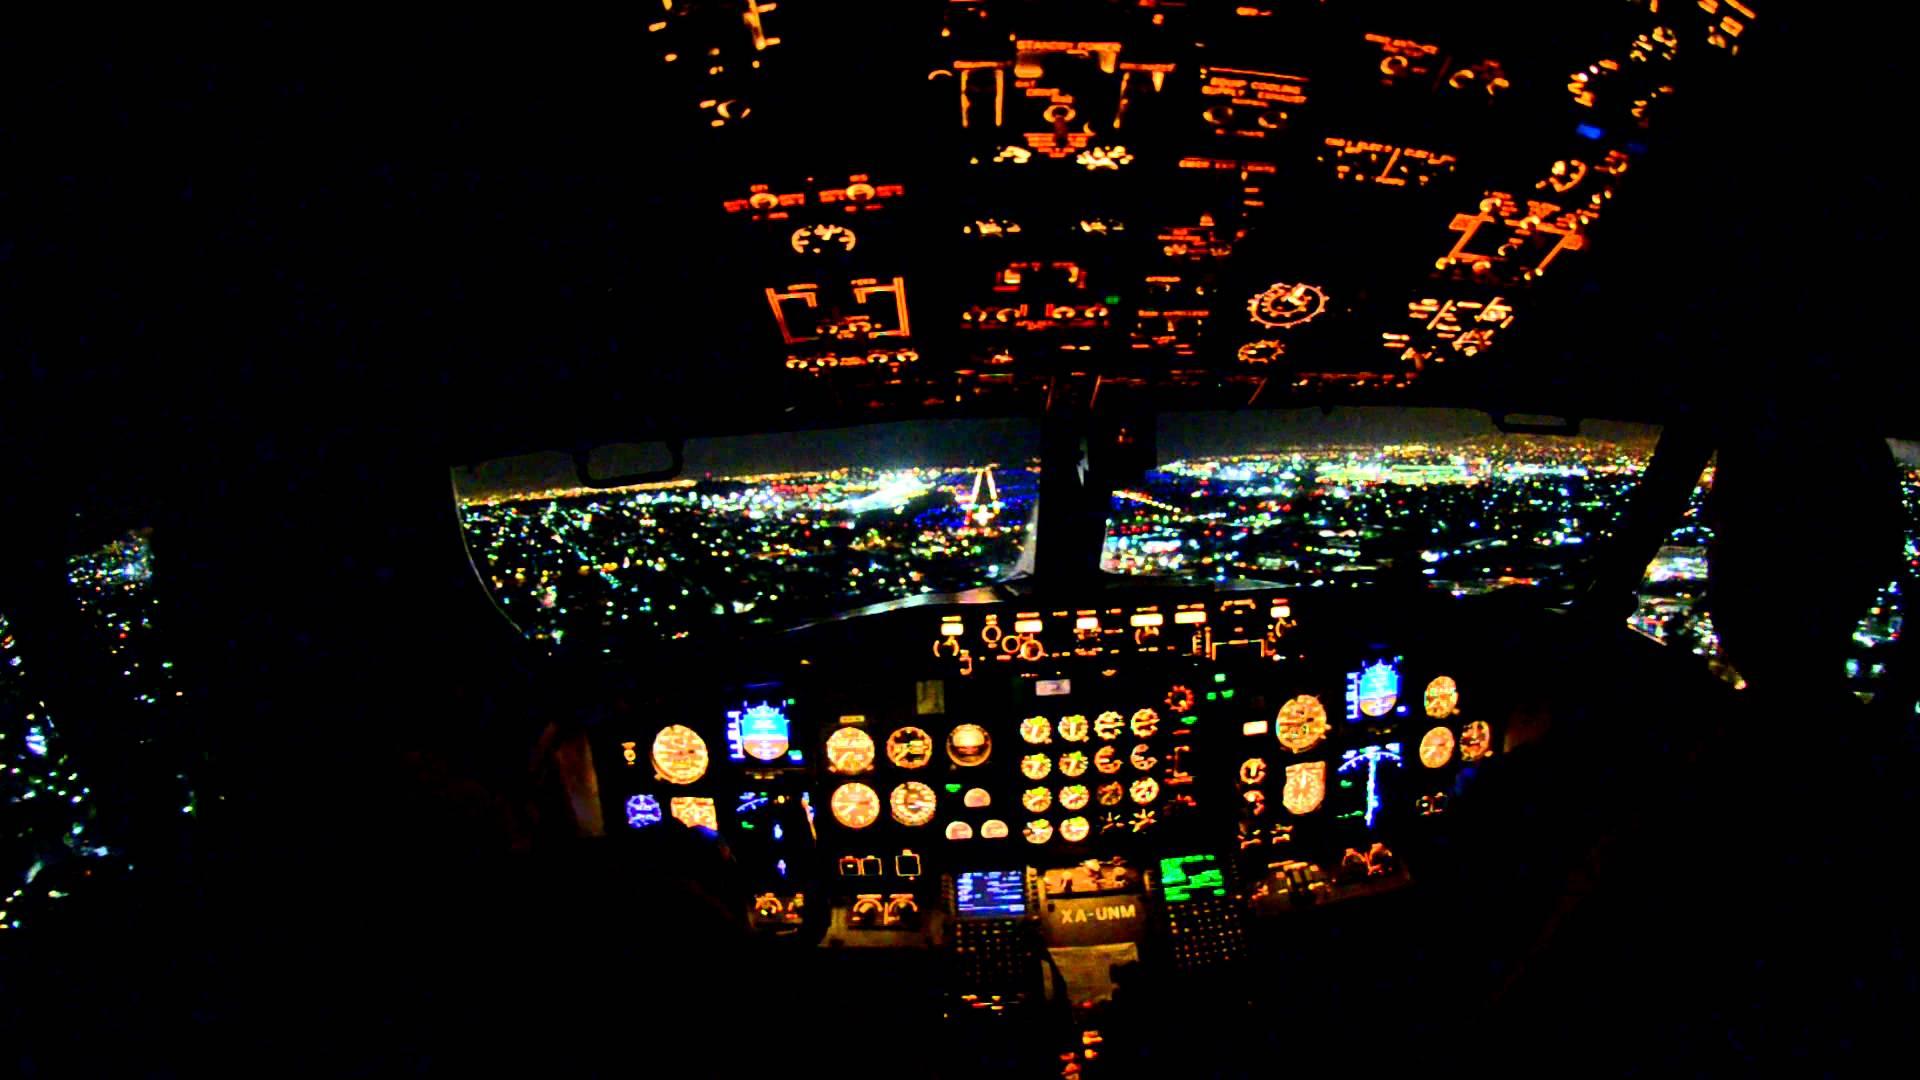 A380 Landing Wallpaper - WallpaperSafari